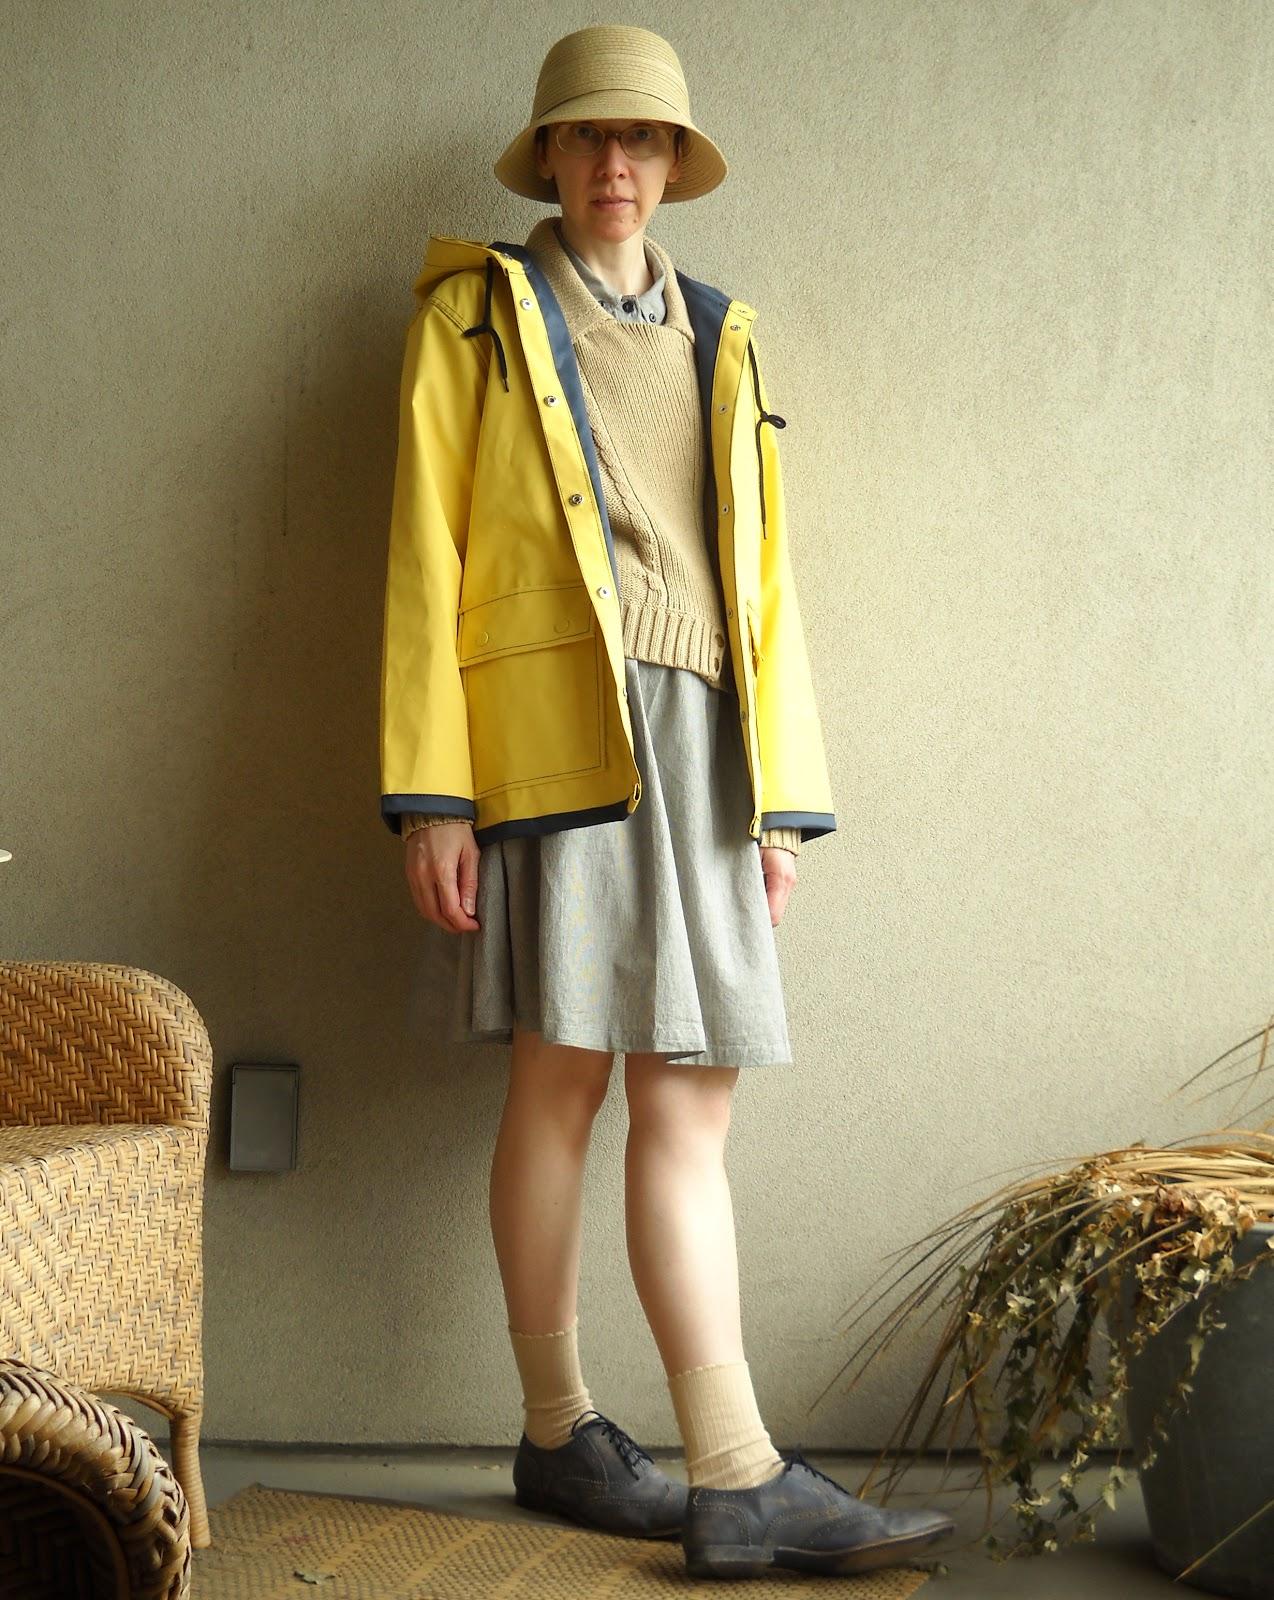 Wardrobe Tales  The Yellow Rain Slicker And The Cloche Hats d3bfc3ca3b9